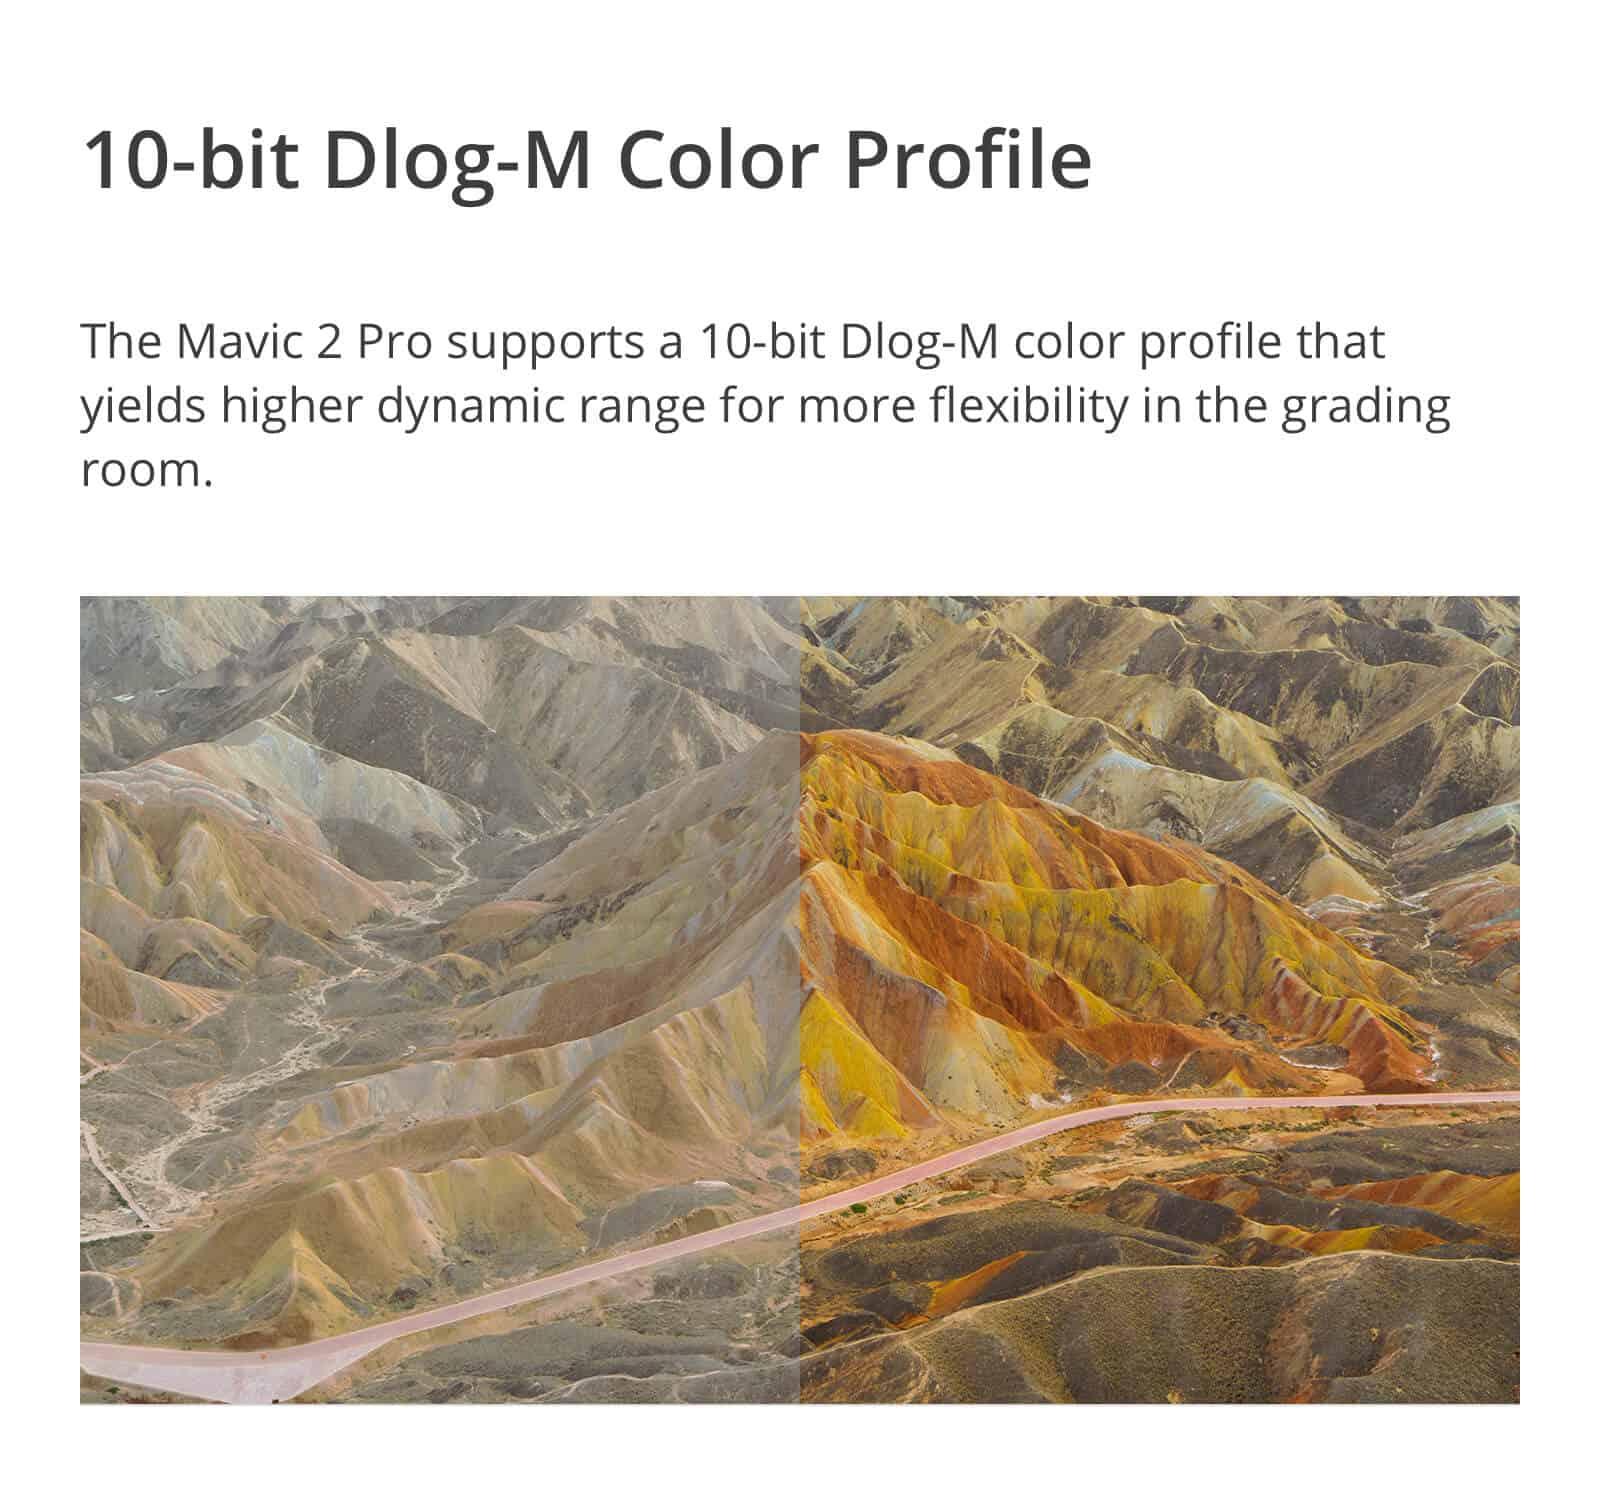 DJI Mavic 2 Pro JWStuff 17